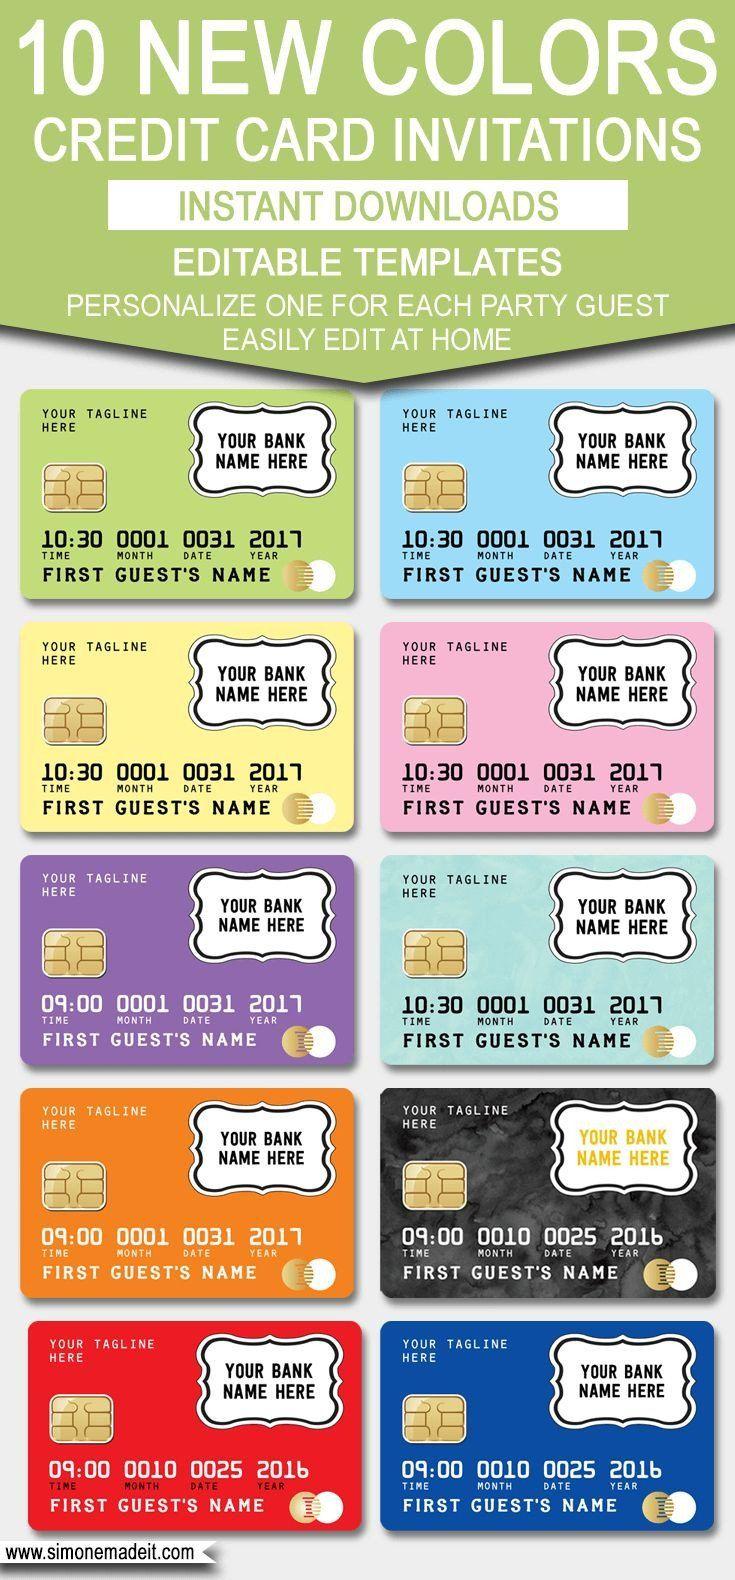 Credit Card Invitation Template Beautiful Credit Card Invitation Template Carddesigntemplatefree Party Invitations Diy Invitation Cards Kids Credit Card